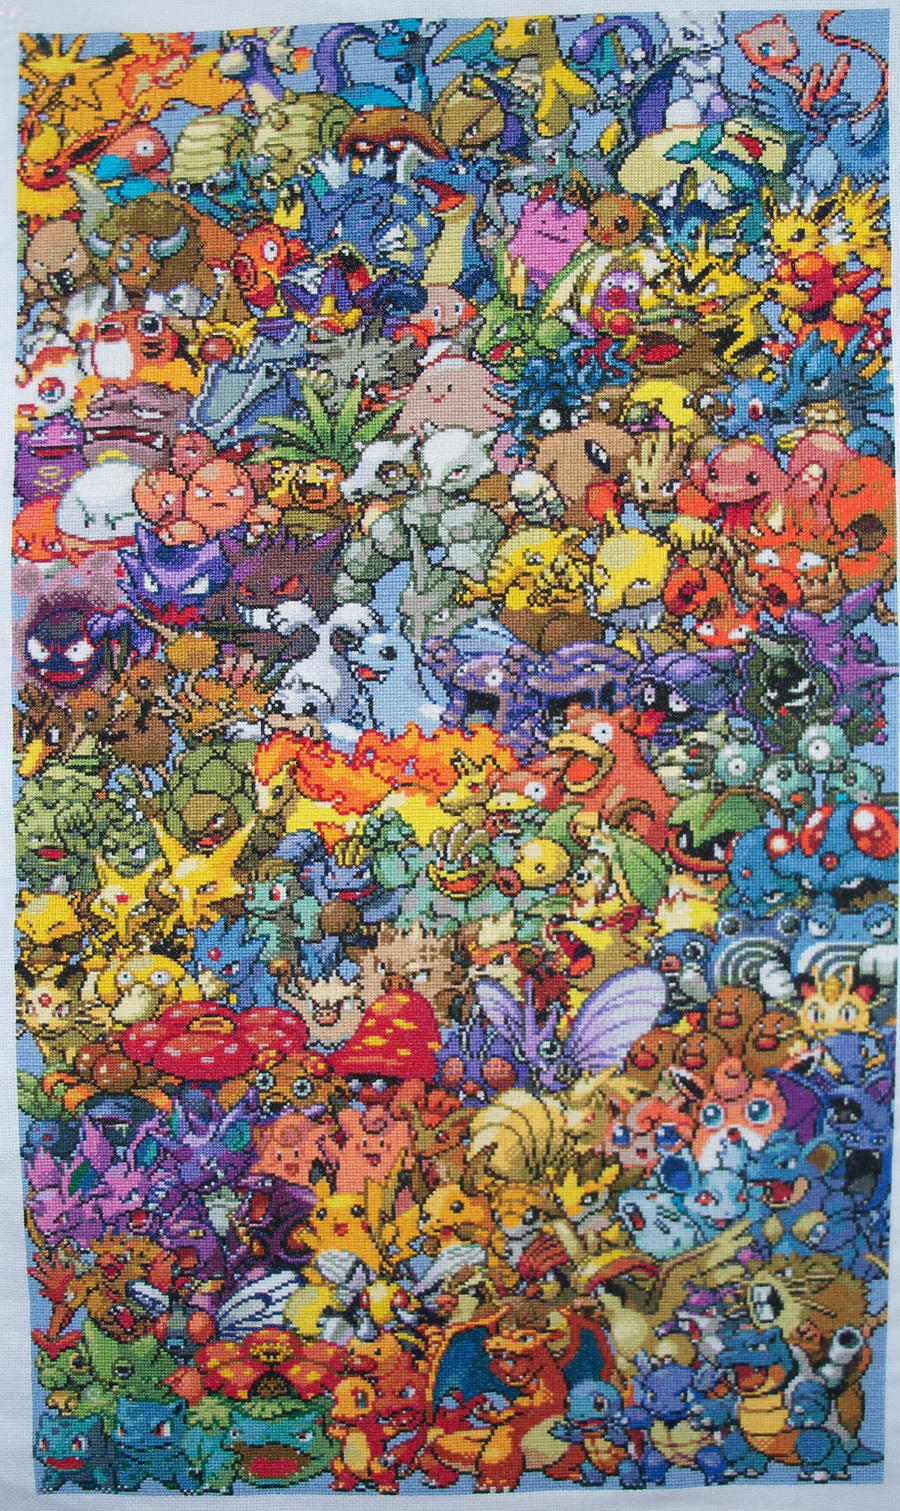 Epic Pokemon Generation 1 Cross Stitch Complete by lizardlea